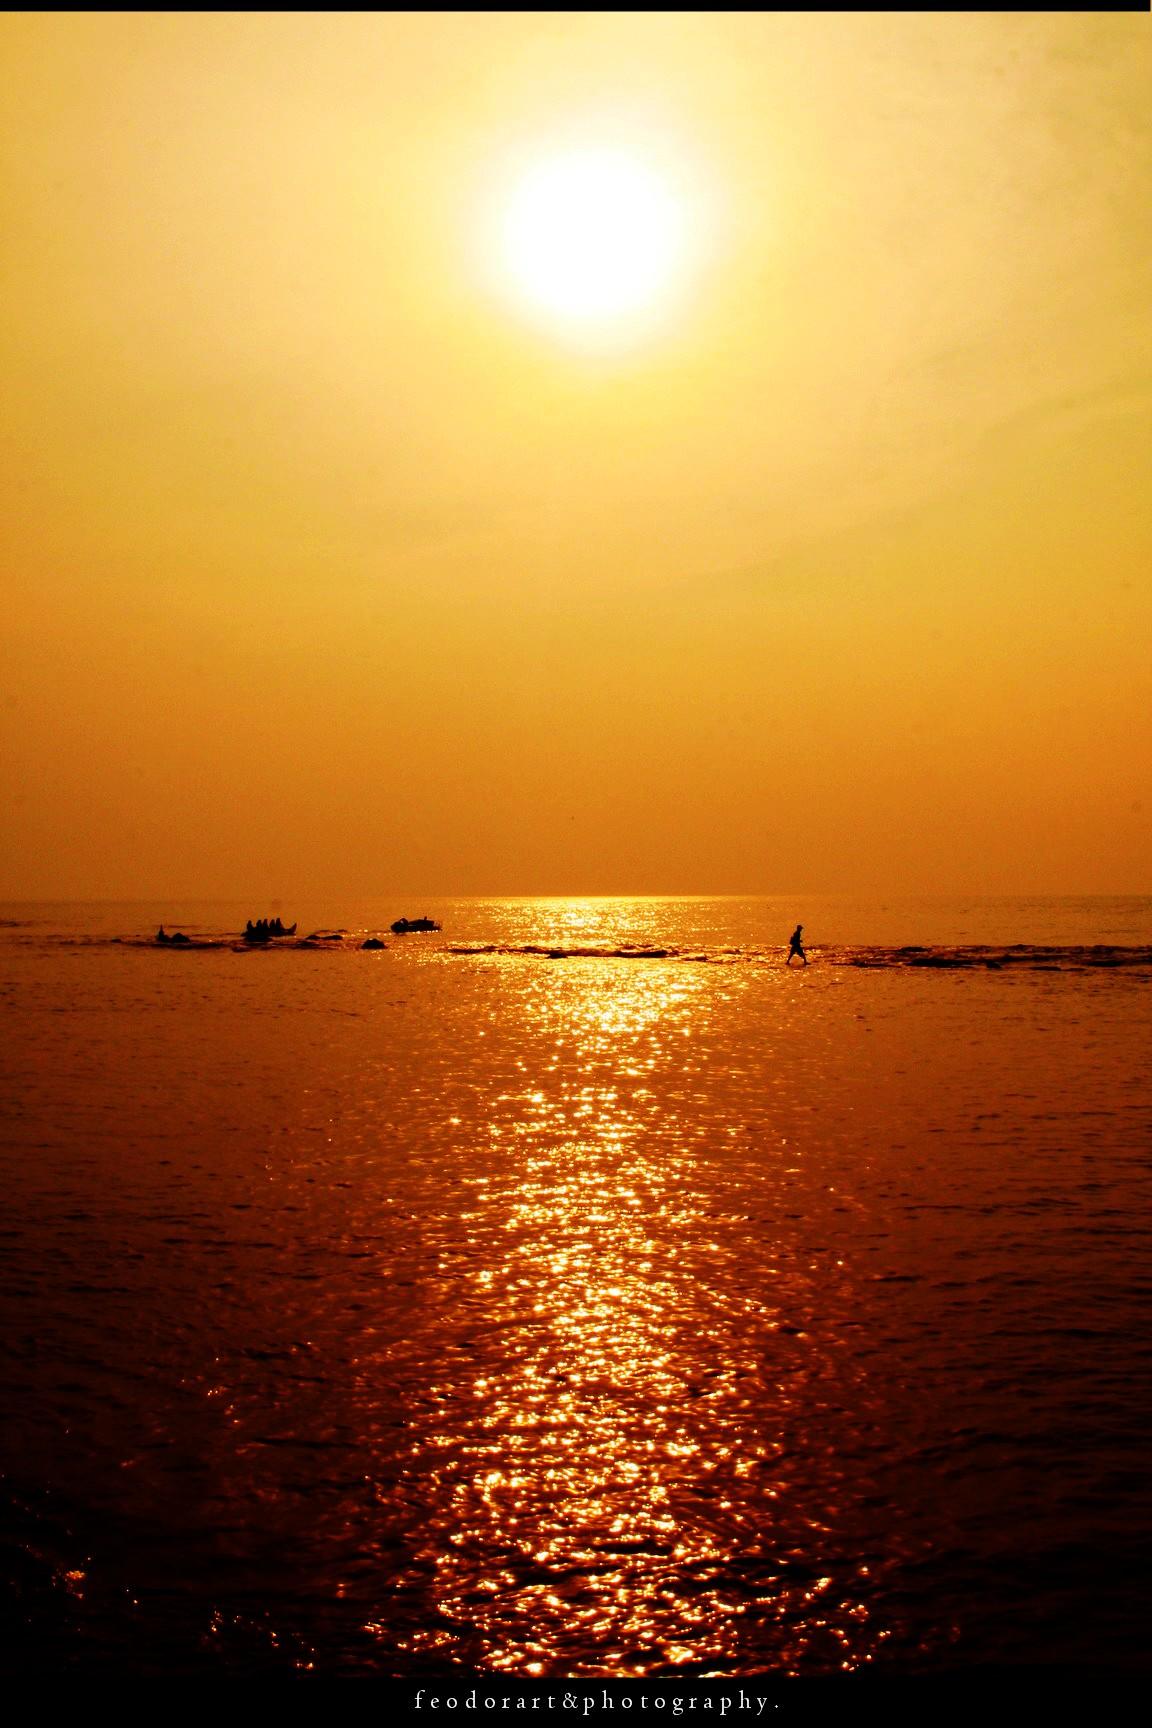 rynobengawan 31 15 pemandangan yg membuat galau by rarasekar